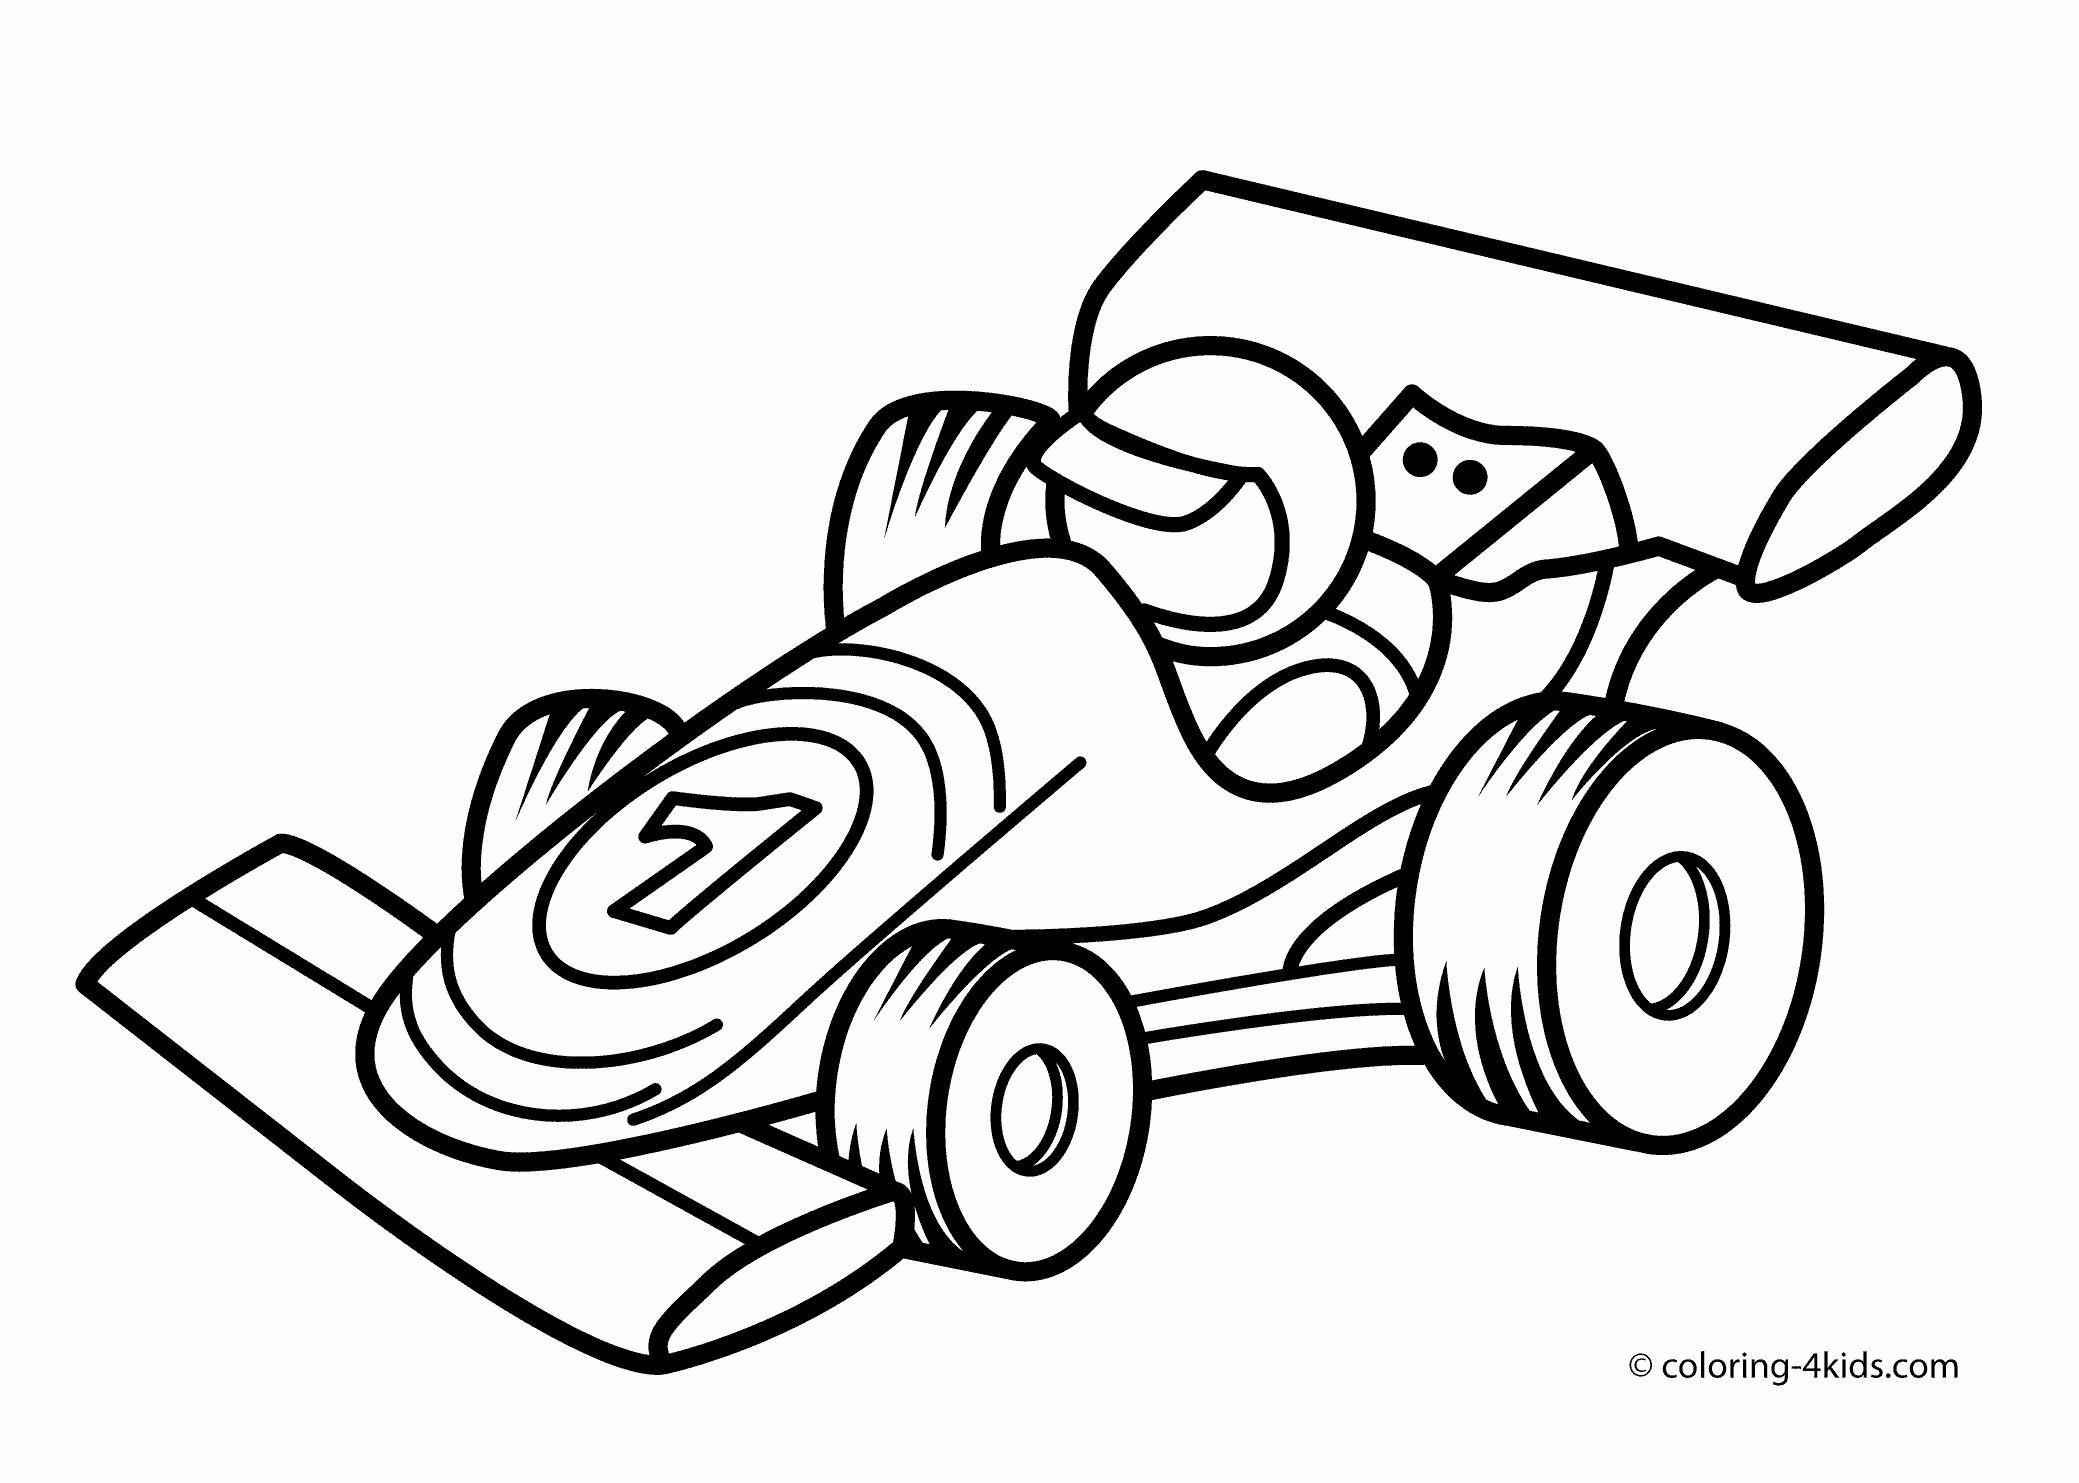 Race Car Printable Coloring Pages Race Car Coloring Pages Cars Coloring Pages Coloring Pages For Boys